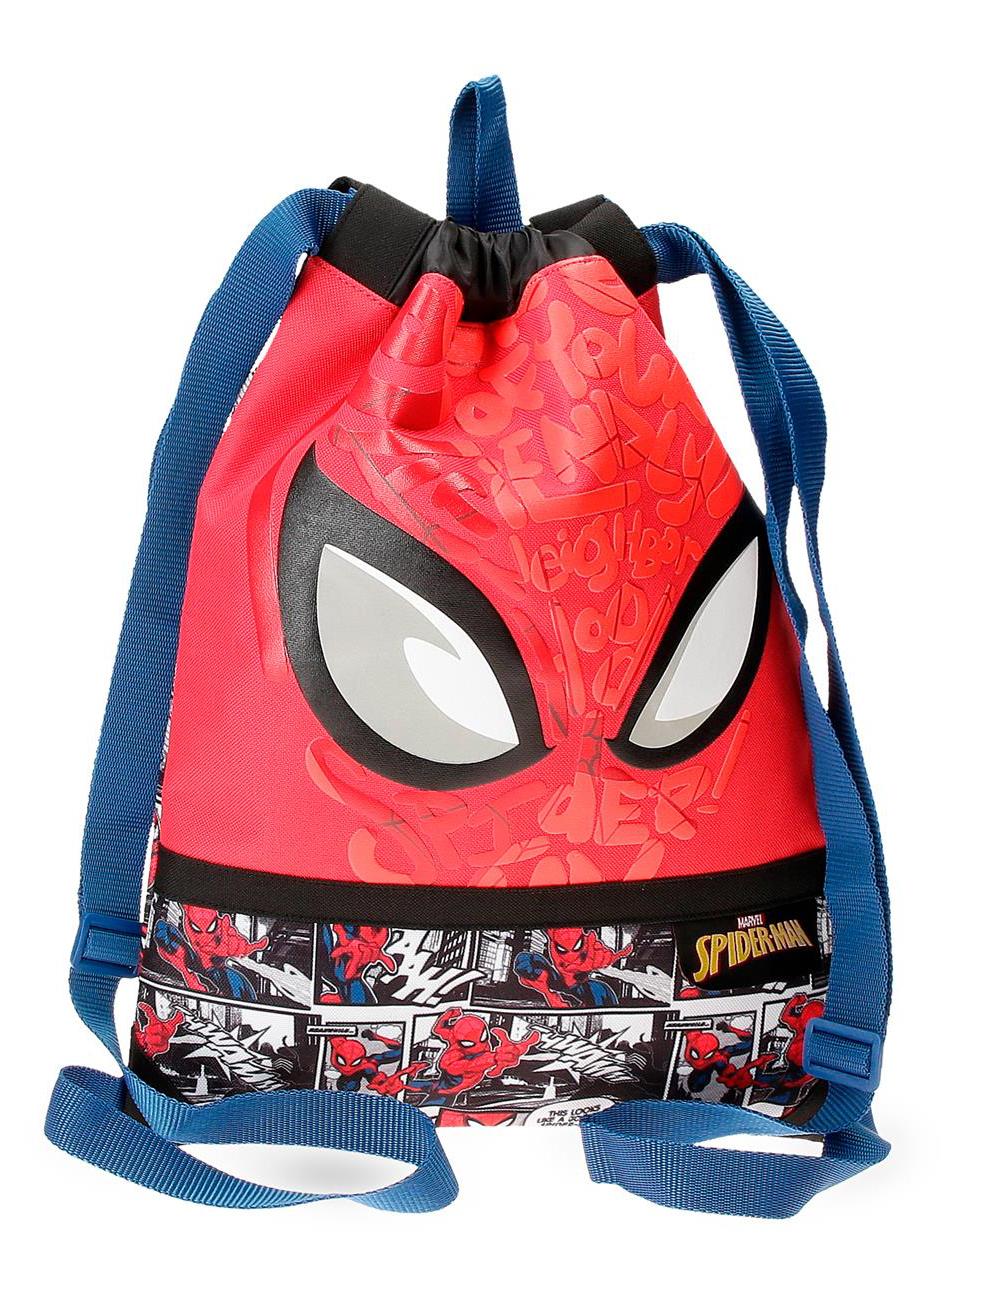 2253821 Gym Sac Spiderman Comic